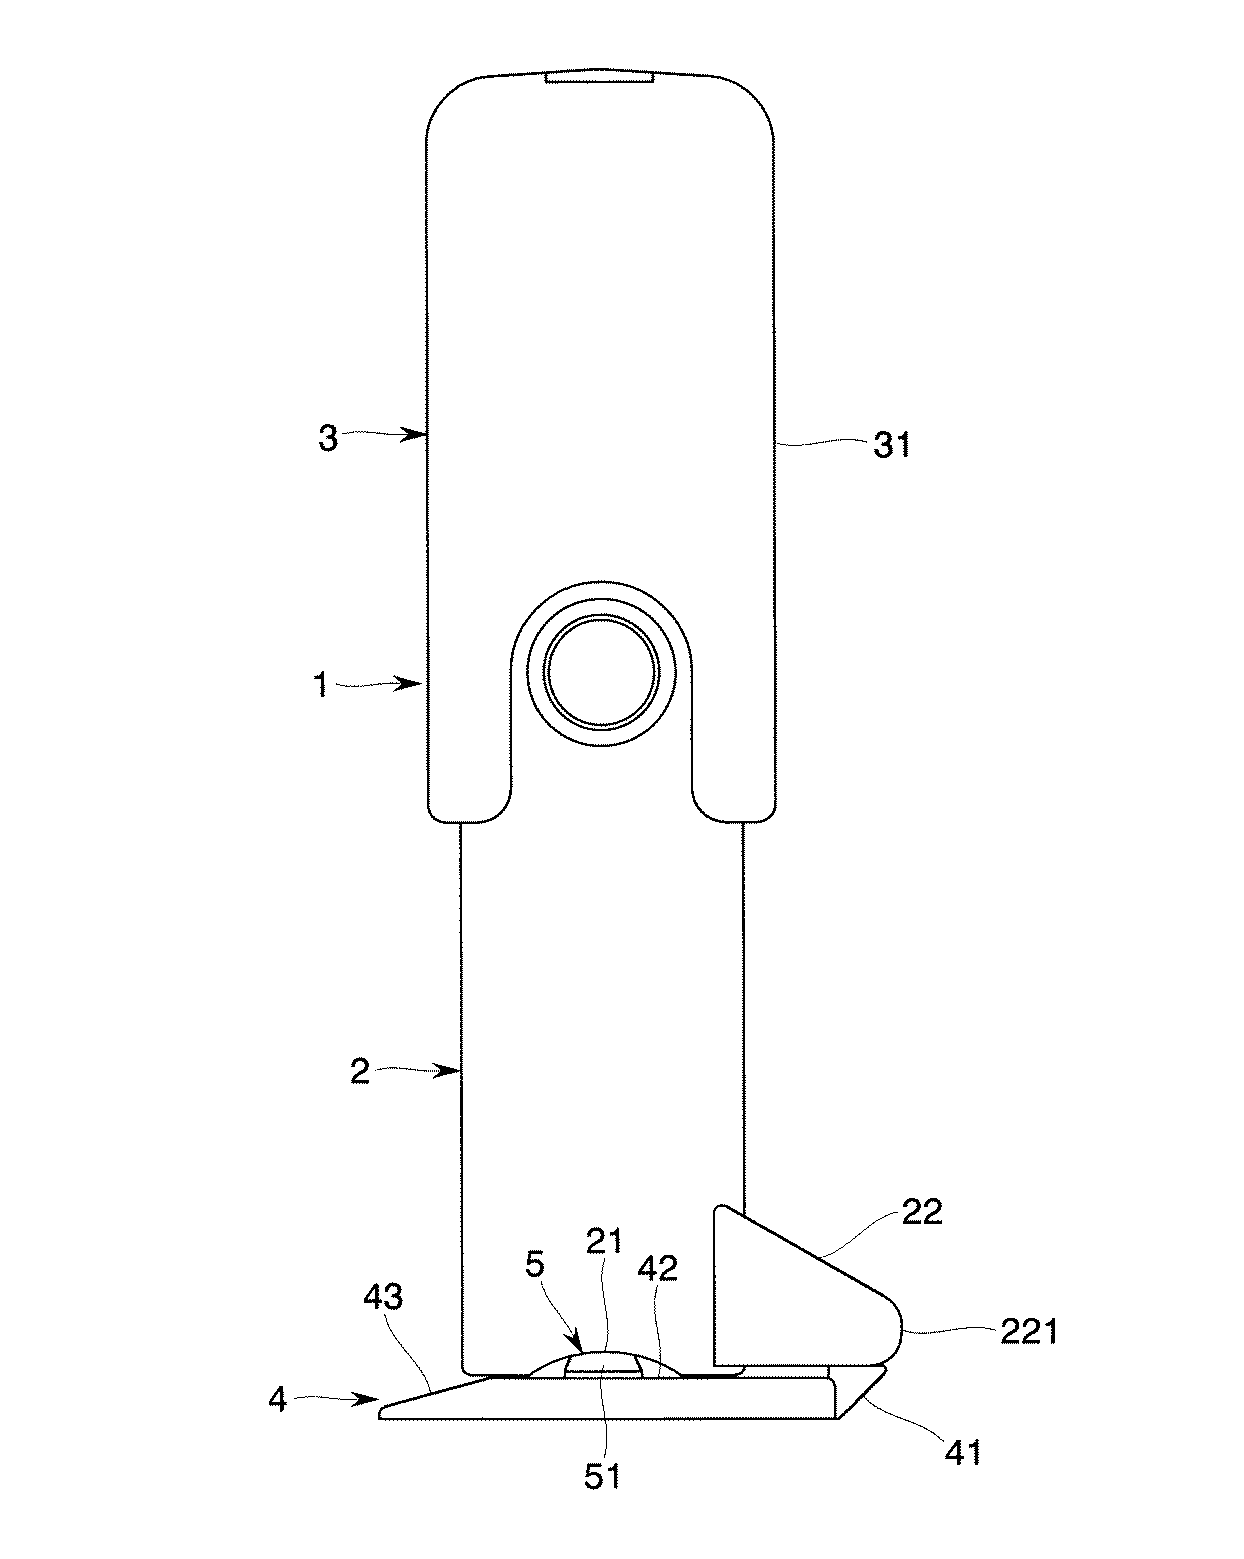 https://patentimages.storage.googleapis.com/JP4972780B2/0004972780.tif/2.png